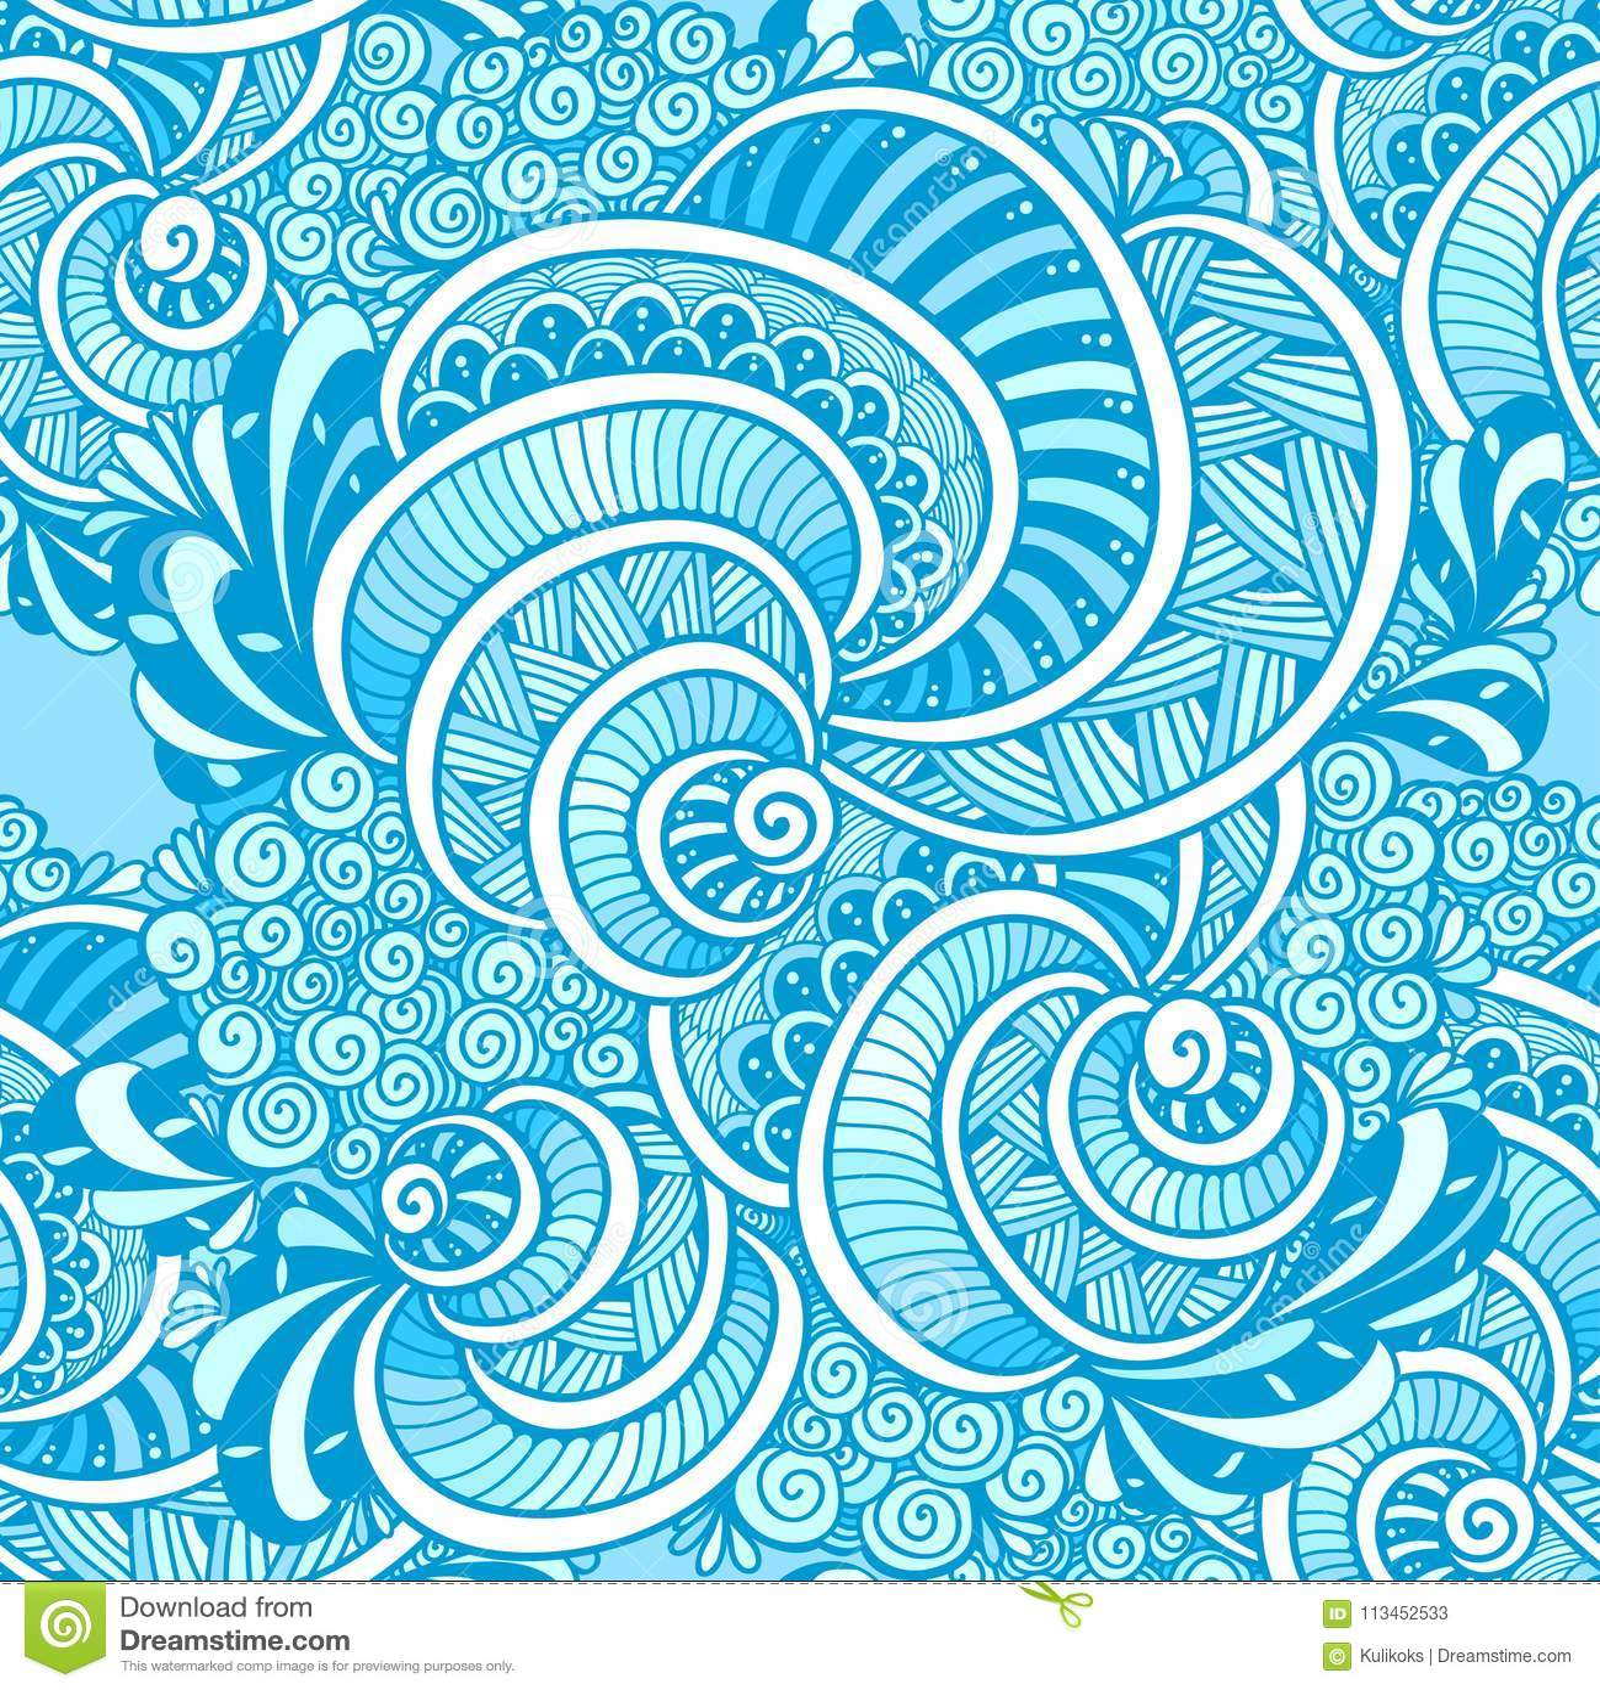 Abstract Zen Tangle Zen Doodle Marine Seamless Pattern Blue Stock